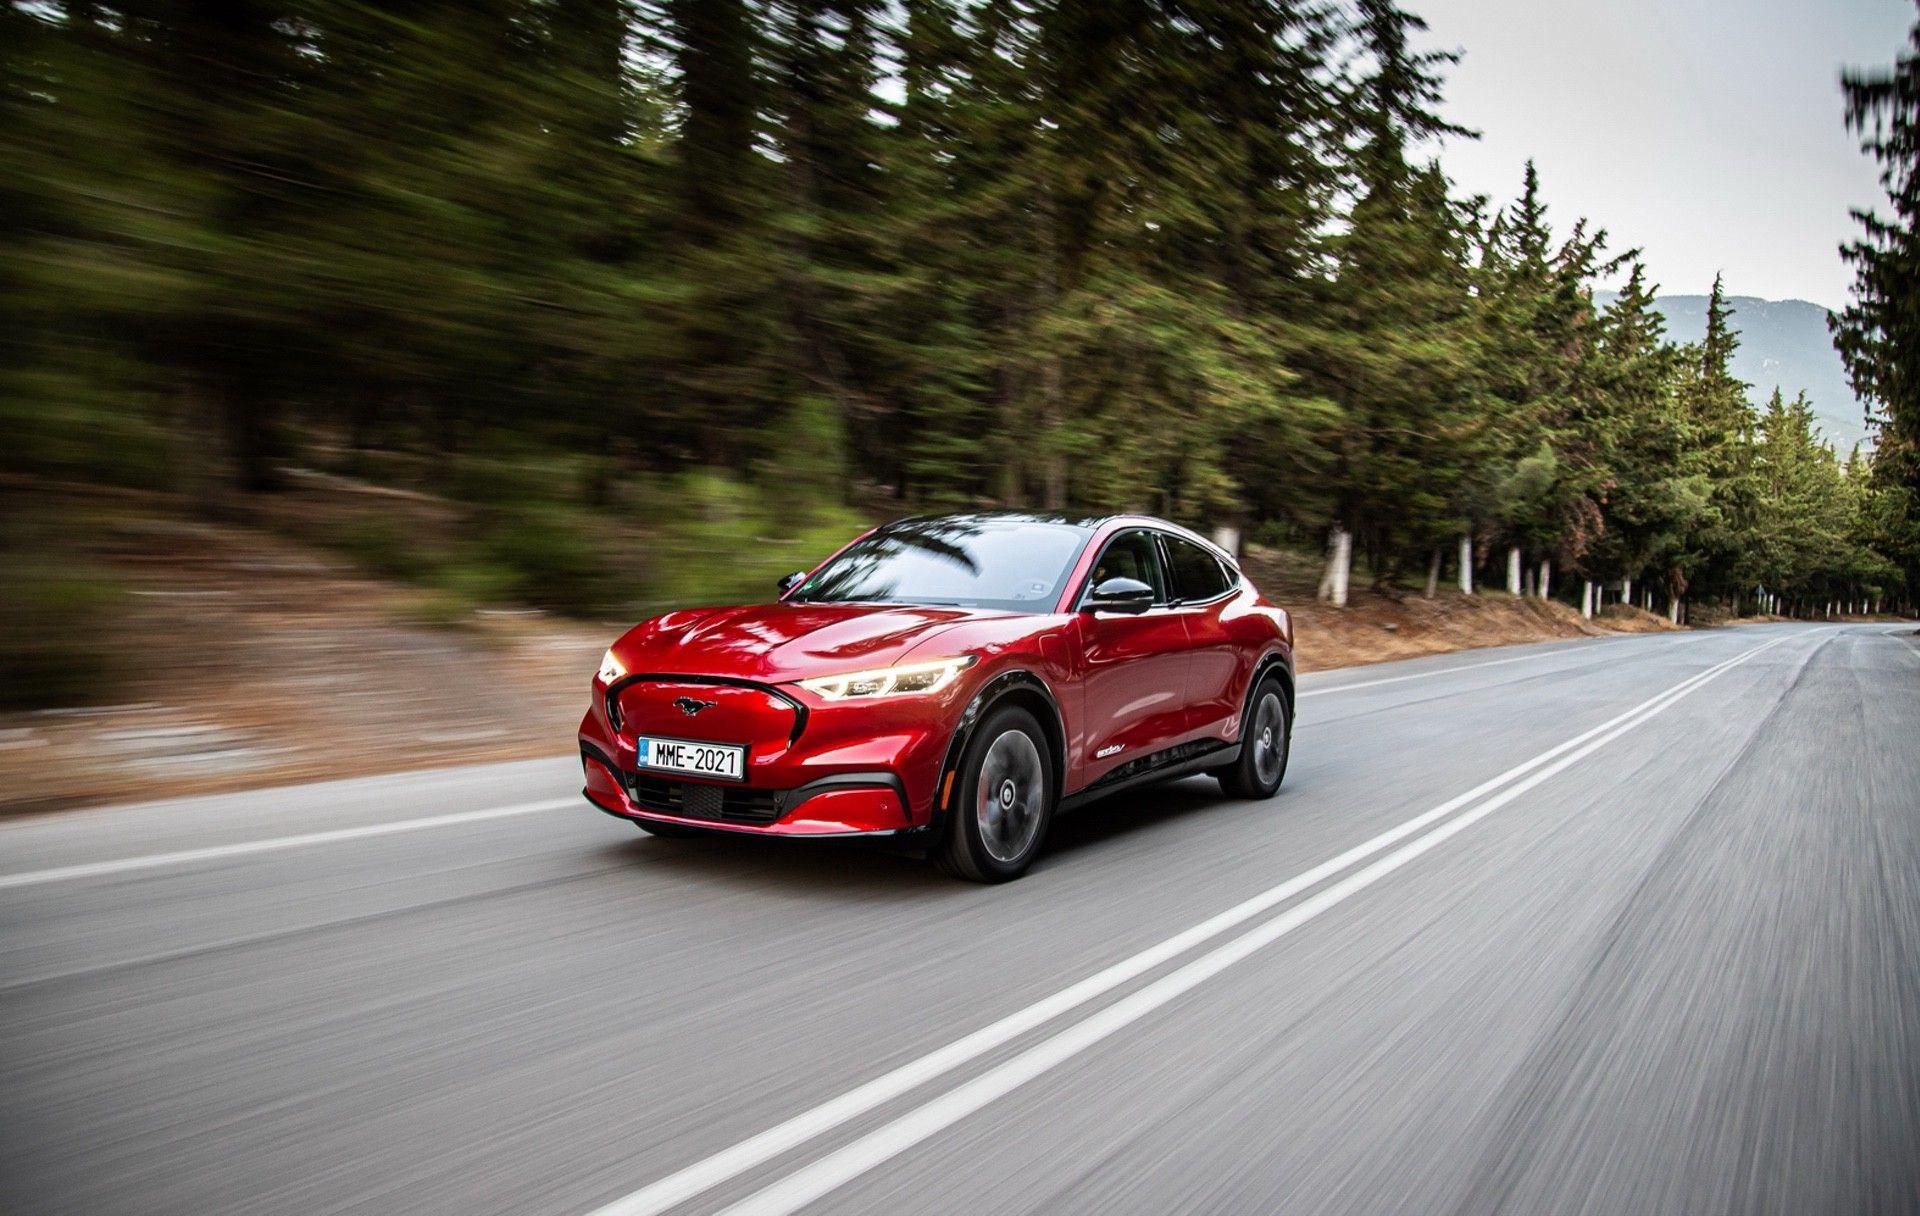 Ford_Mustang_Mach-E_greek_presskit-0075